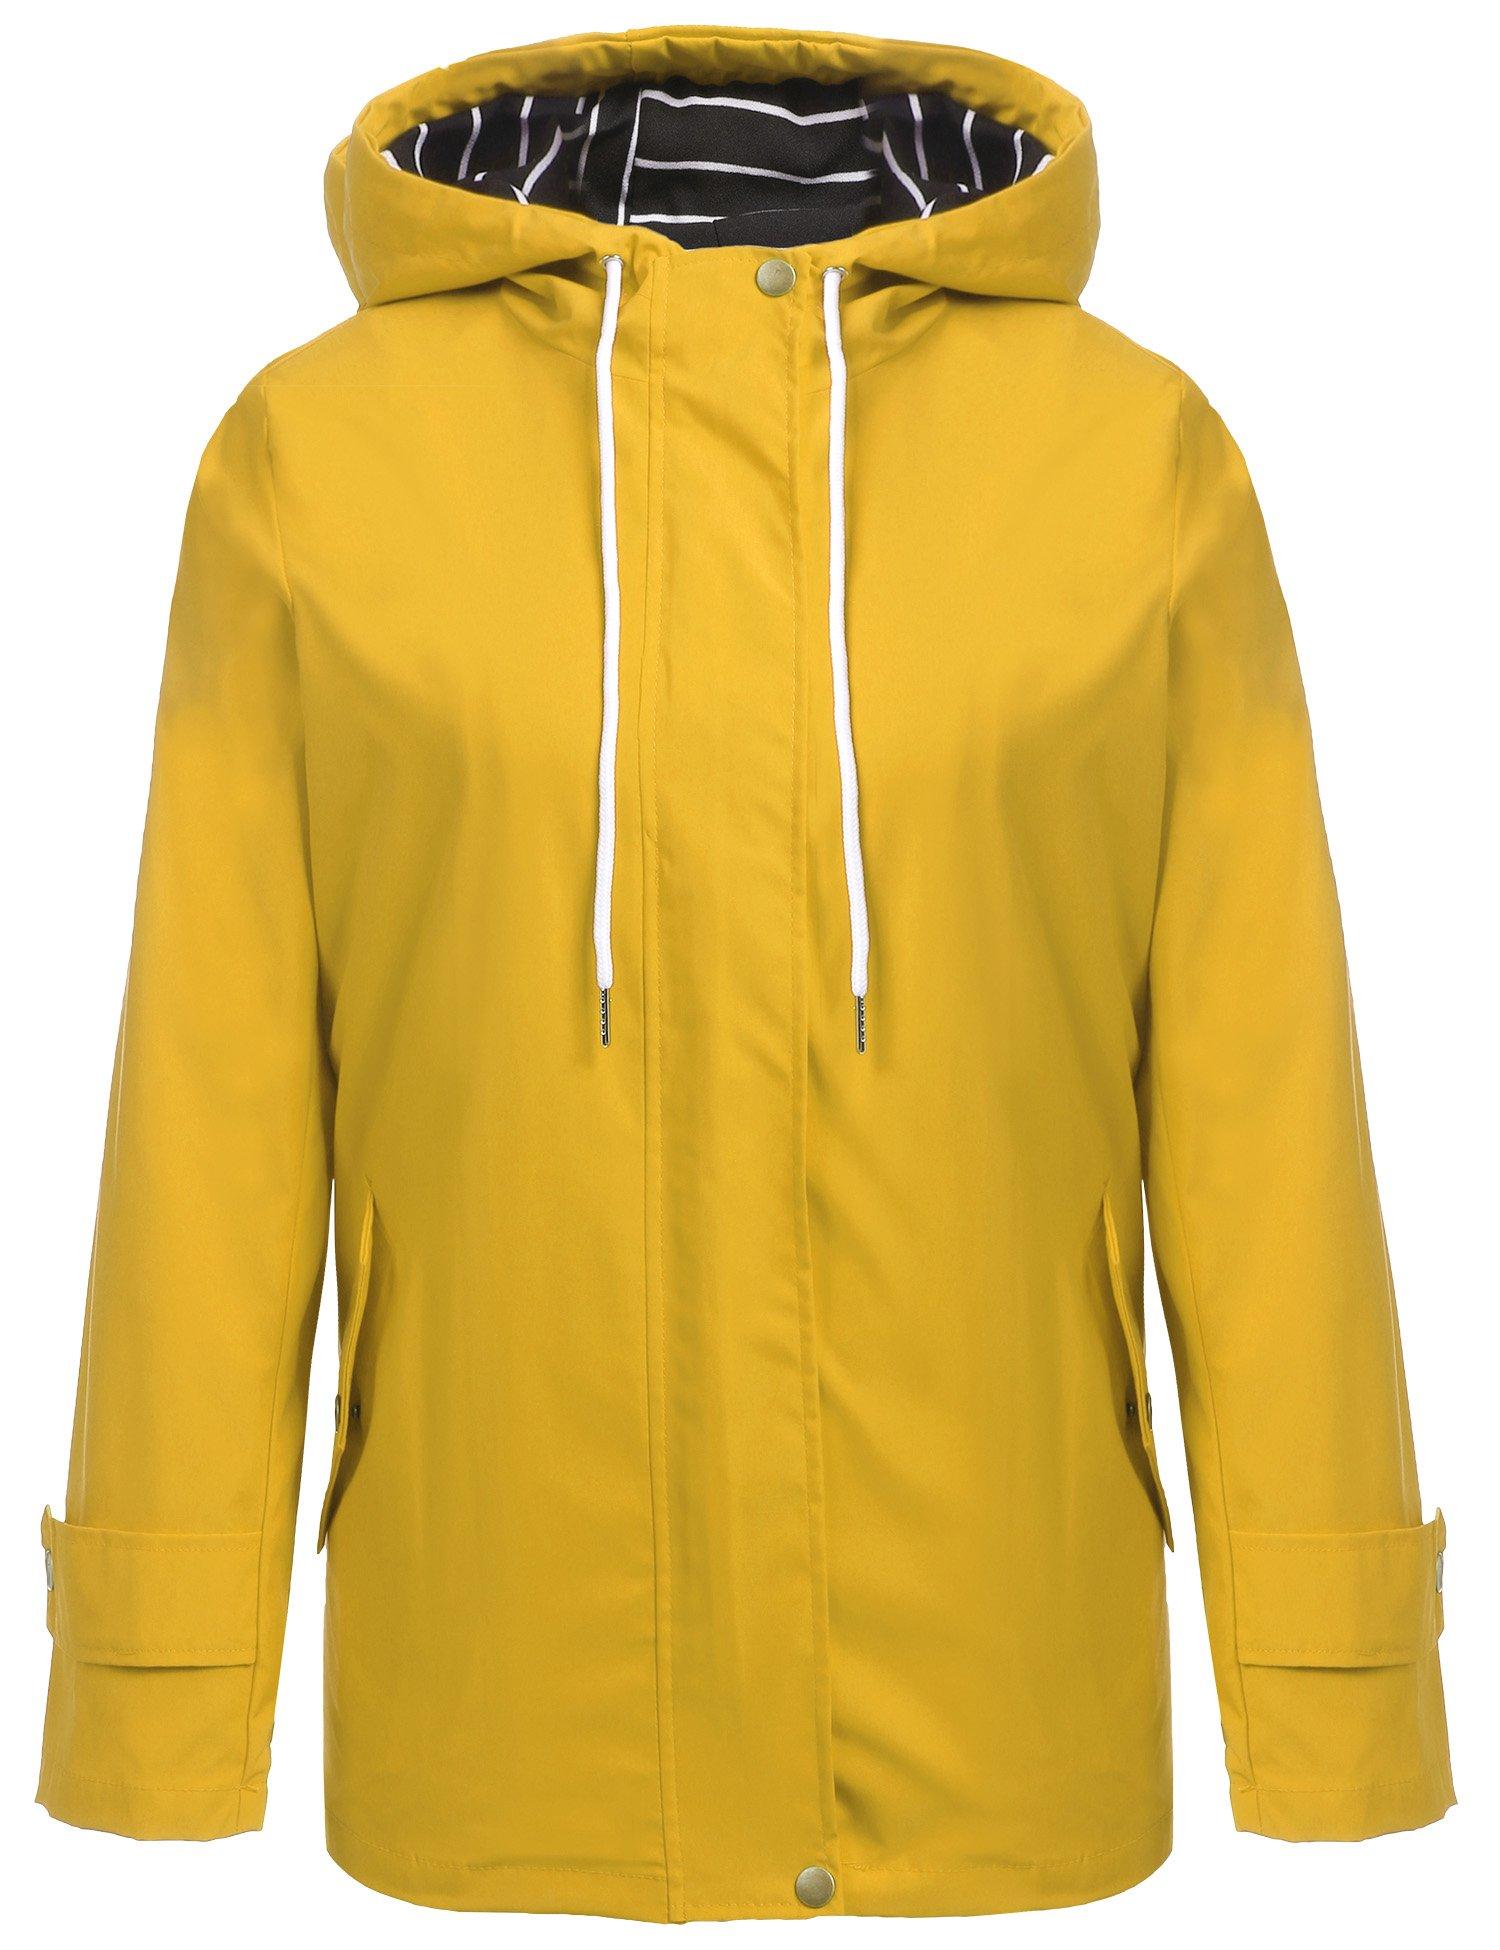 Hount Women Waterproof Lightweight Hooded Raincoat Jacket Solid Rain Jacket Poncho (Middle, Yellow)